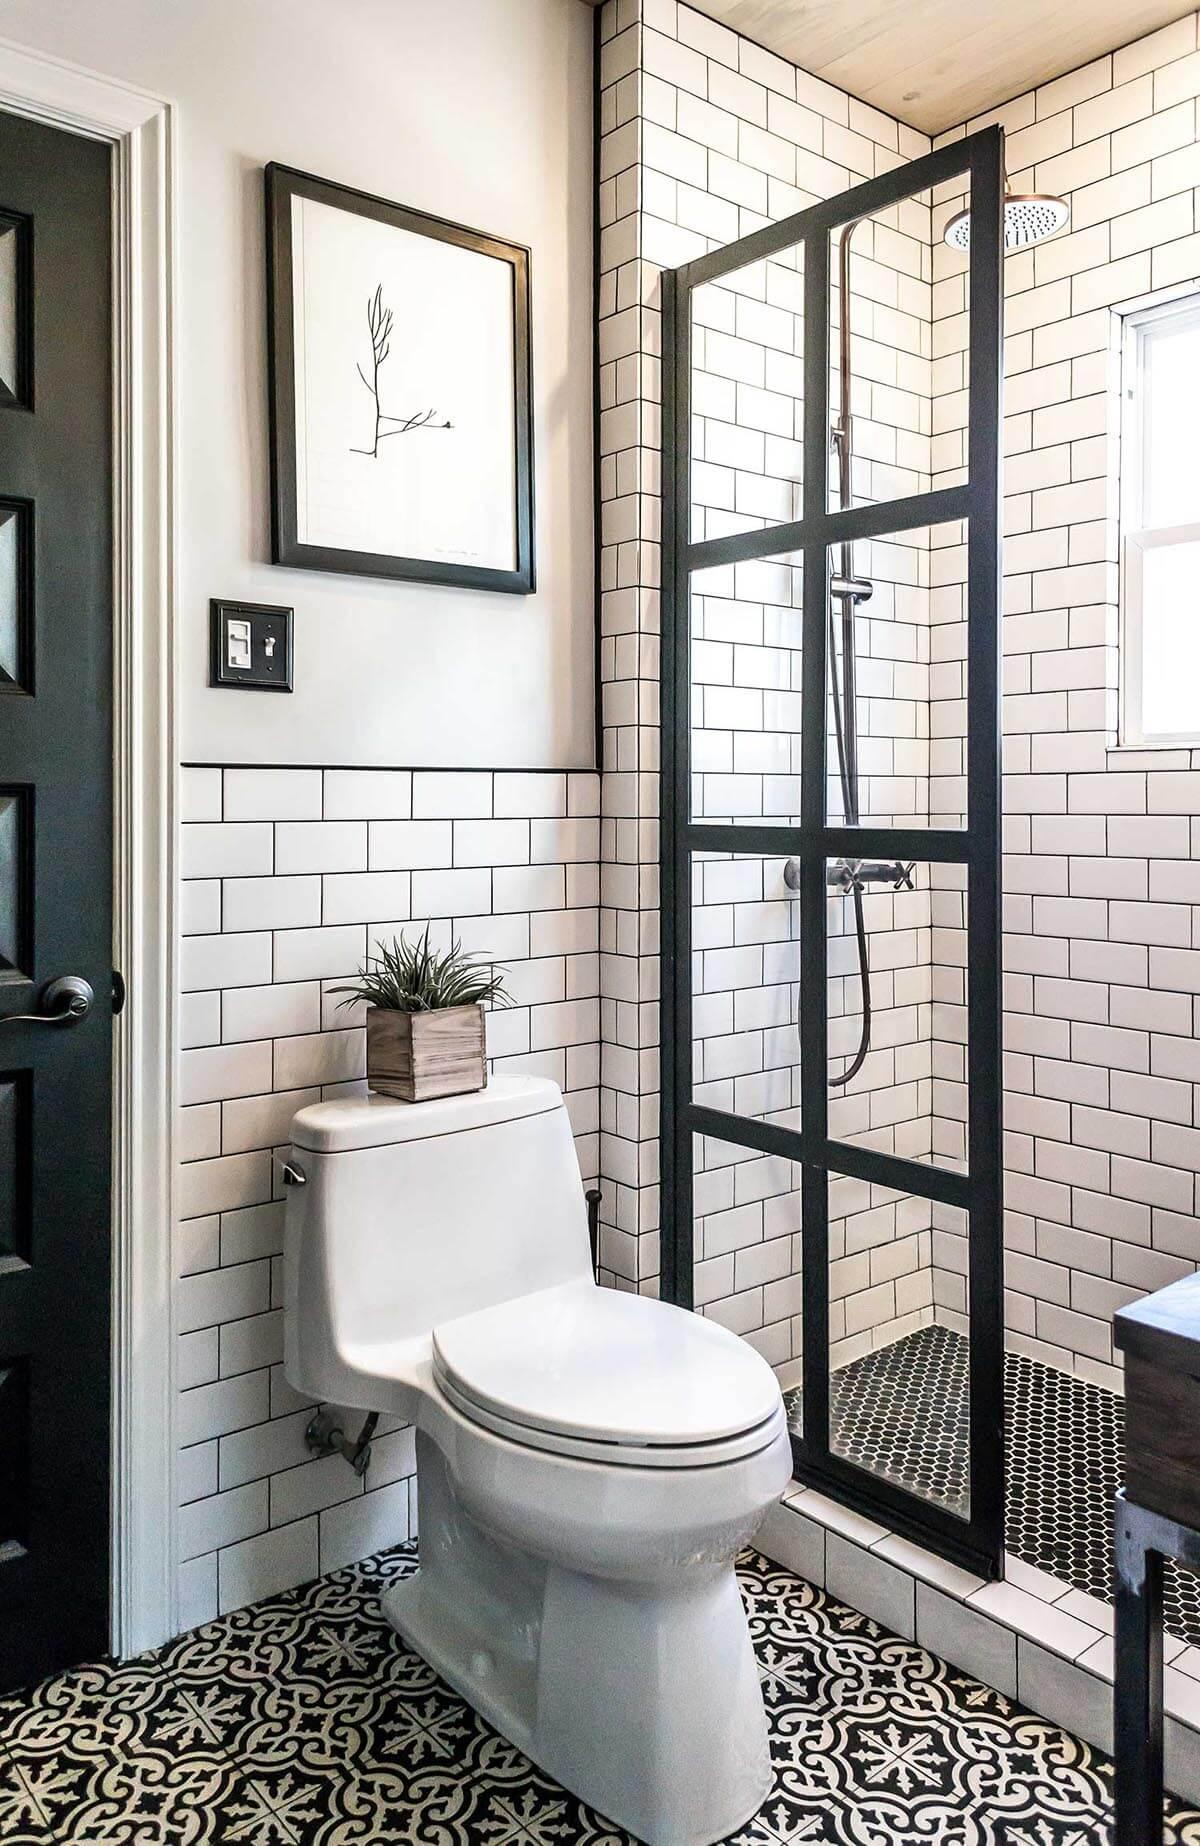 Manhattan Chic Black and White Tiling